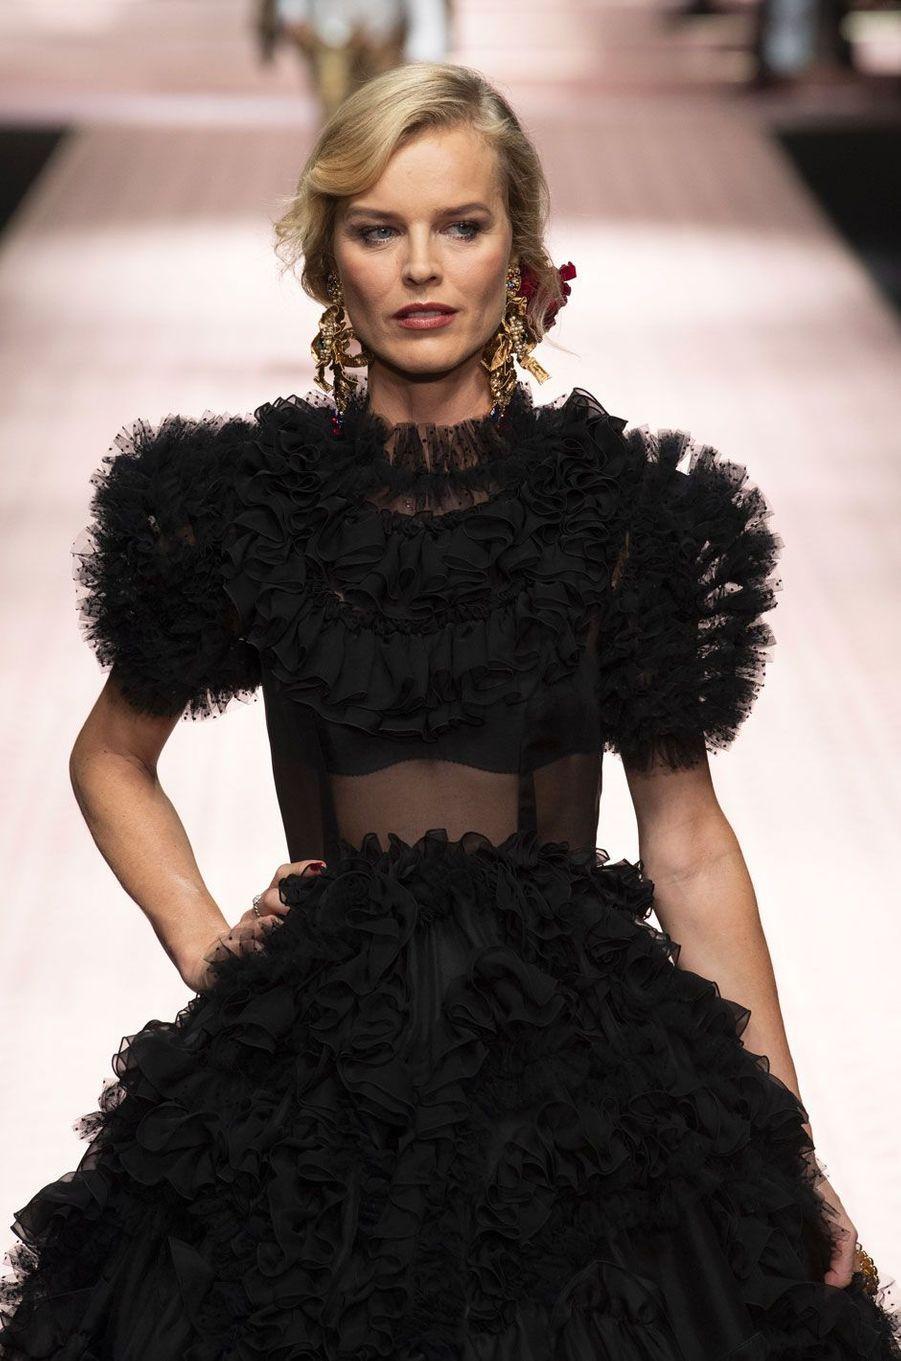 Eva Herzigovadéfile pour Dolce & Gabbana à Milan le 23 septembre 2018